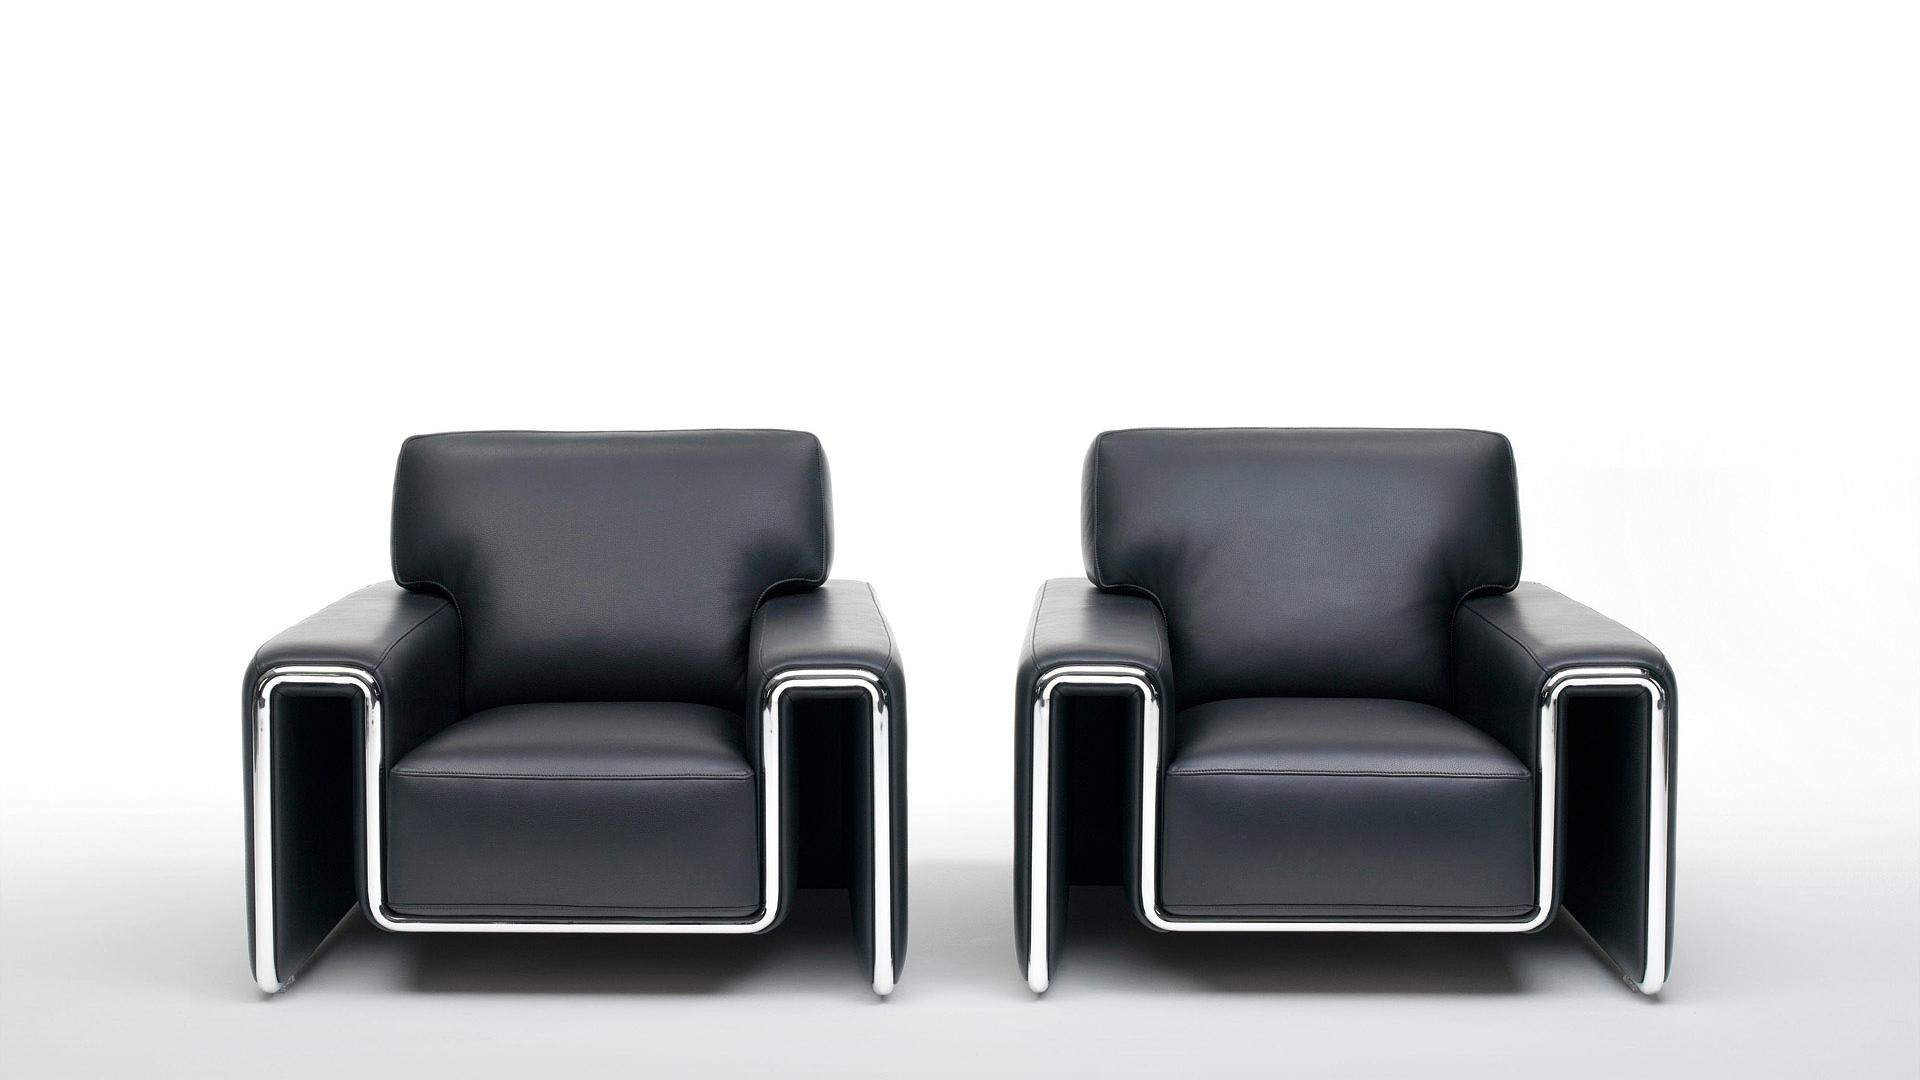 download wallpaper 1920x1080 chair